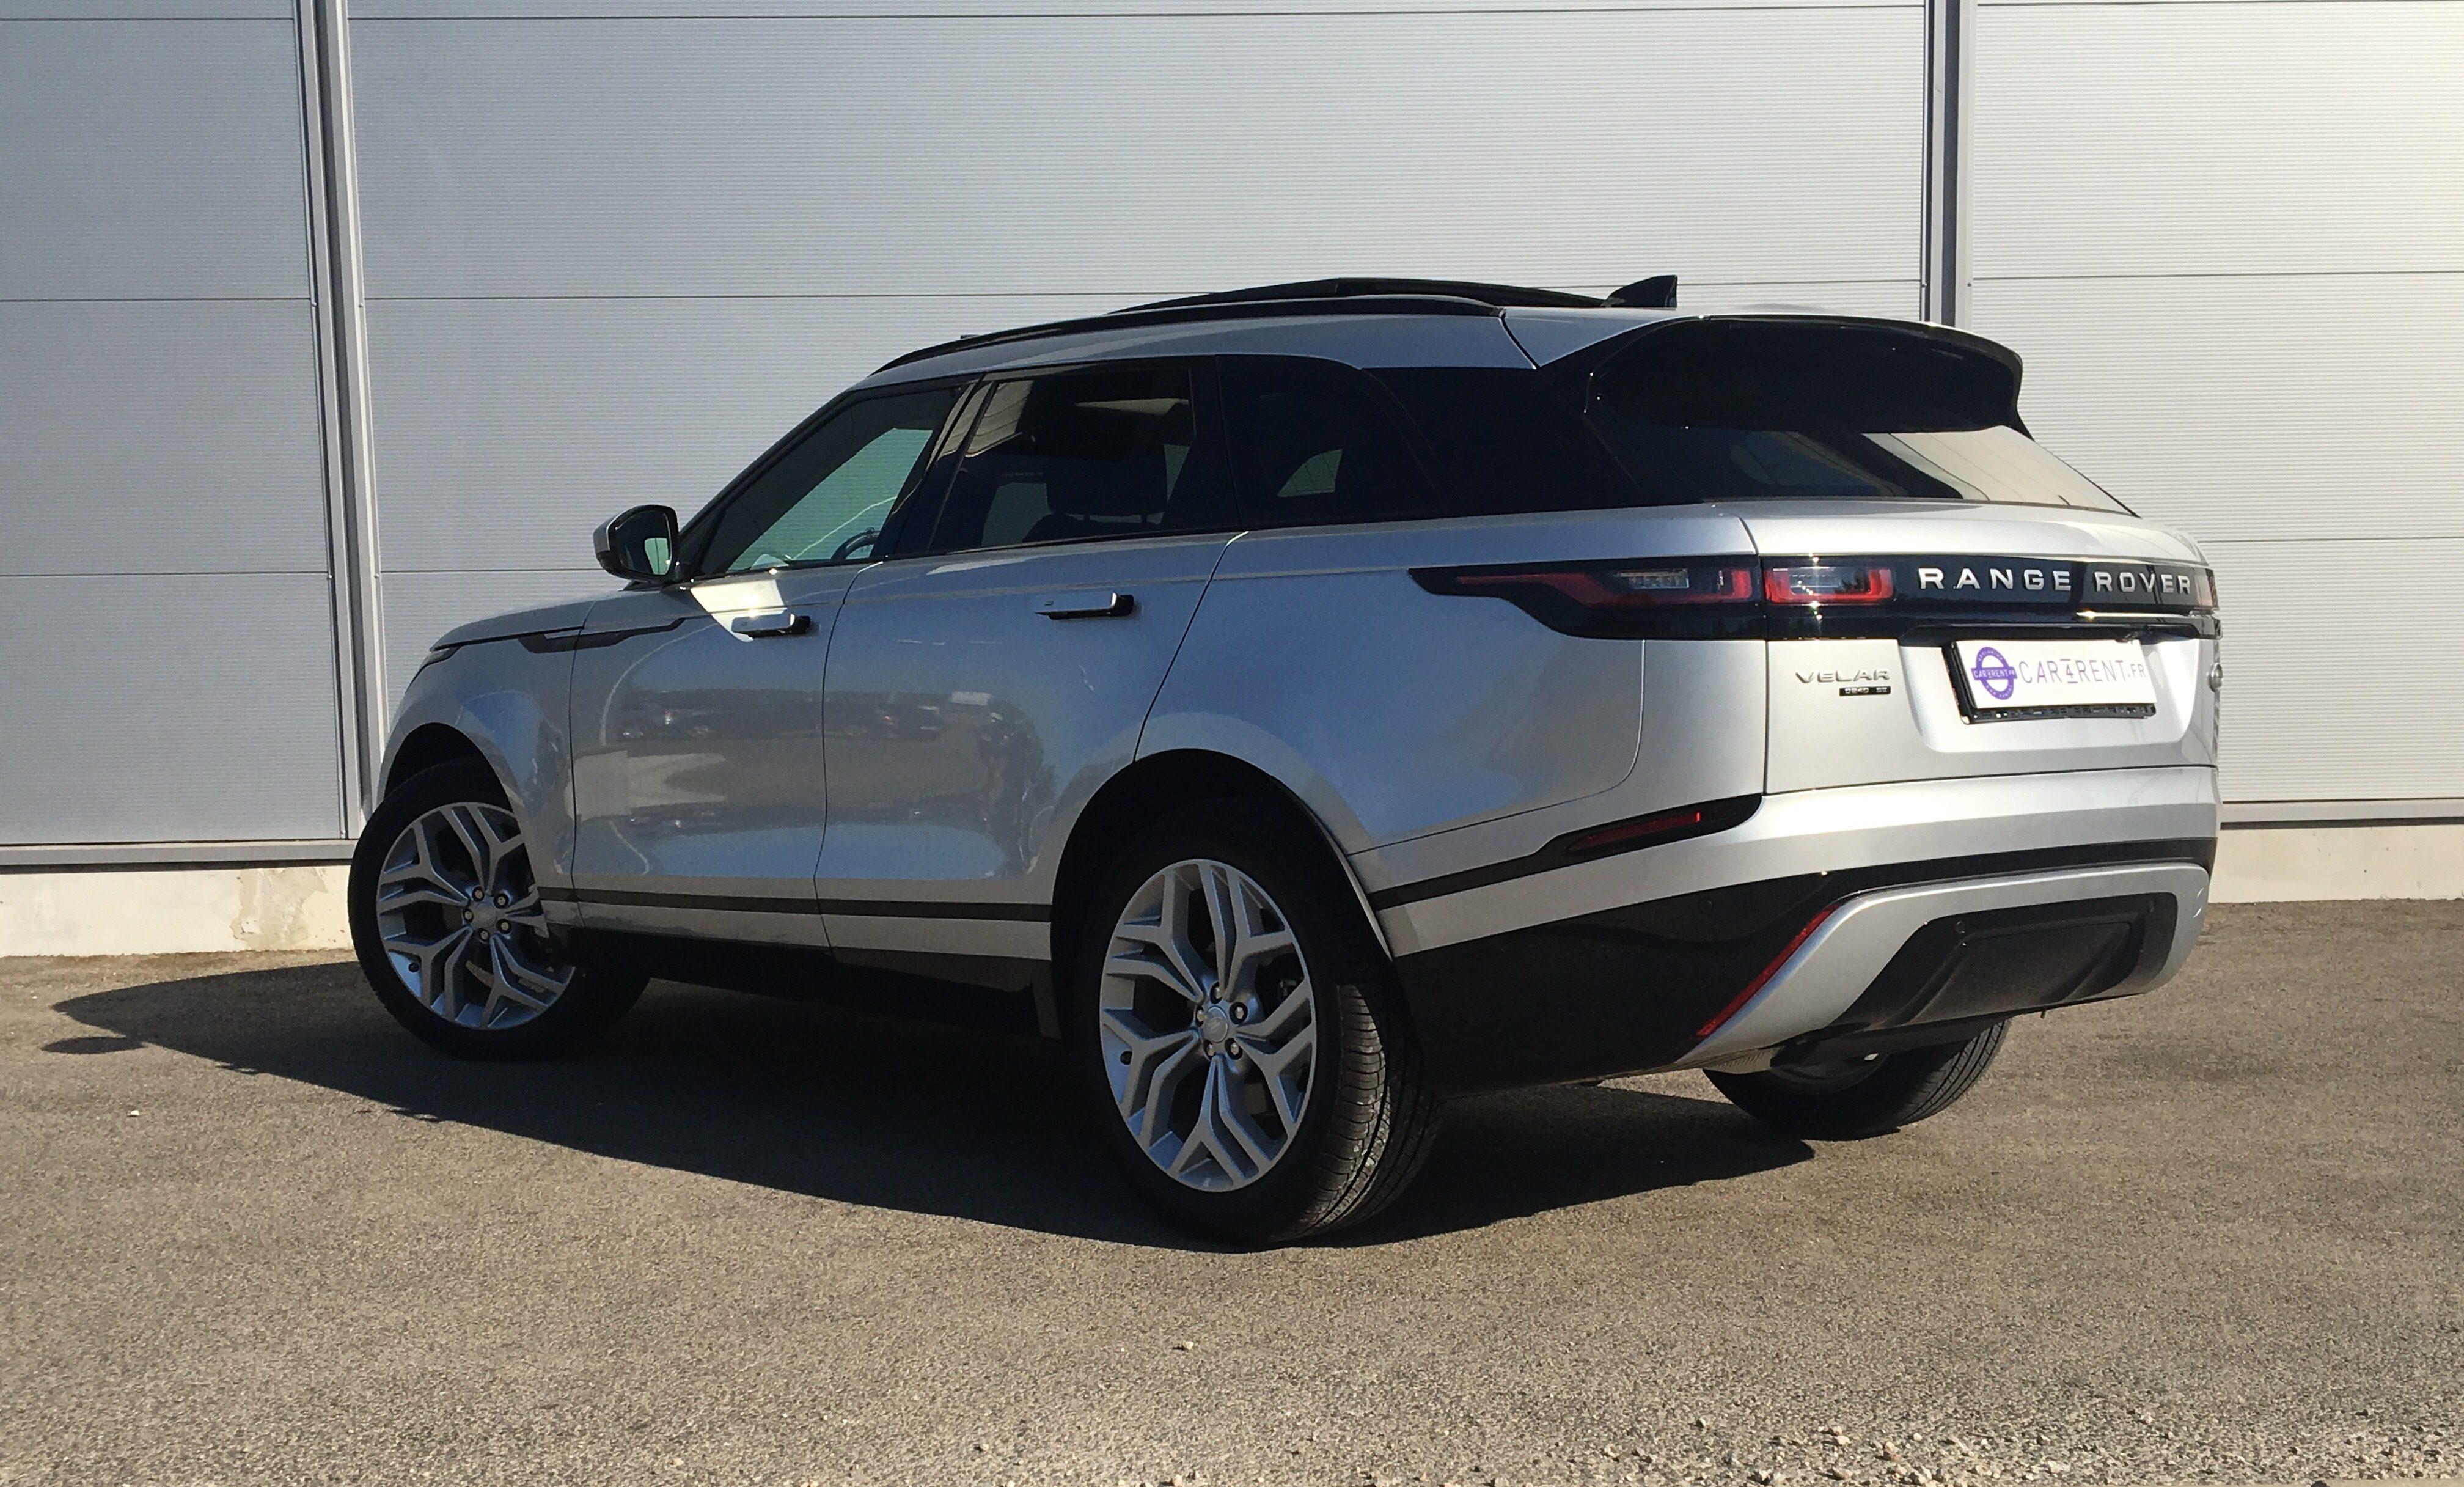 high end car rental range rover car4rent france